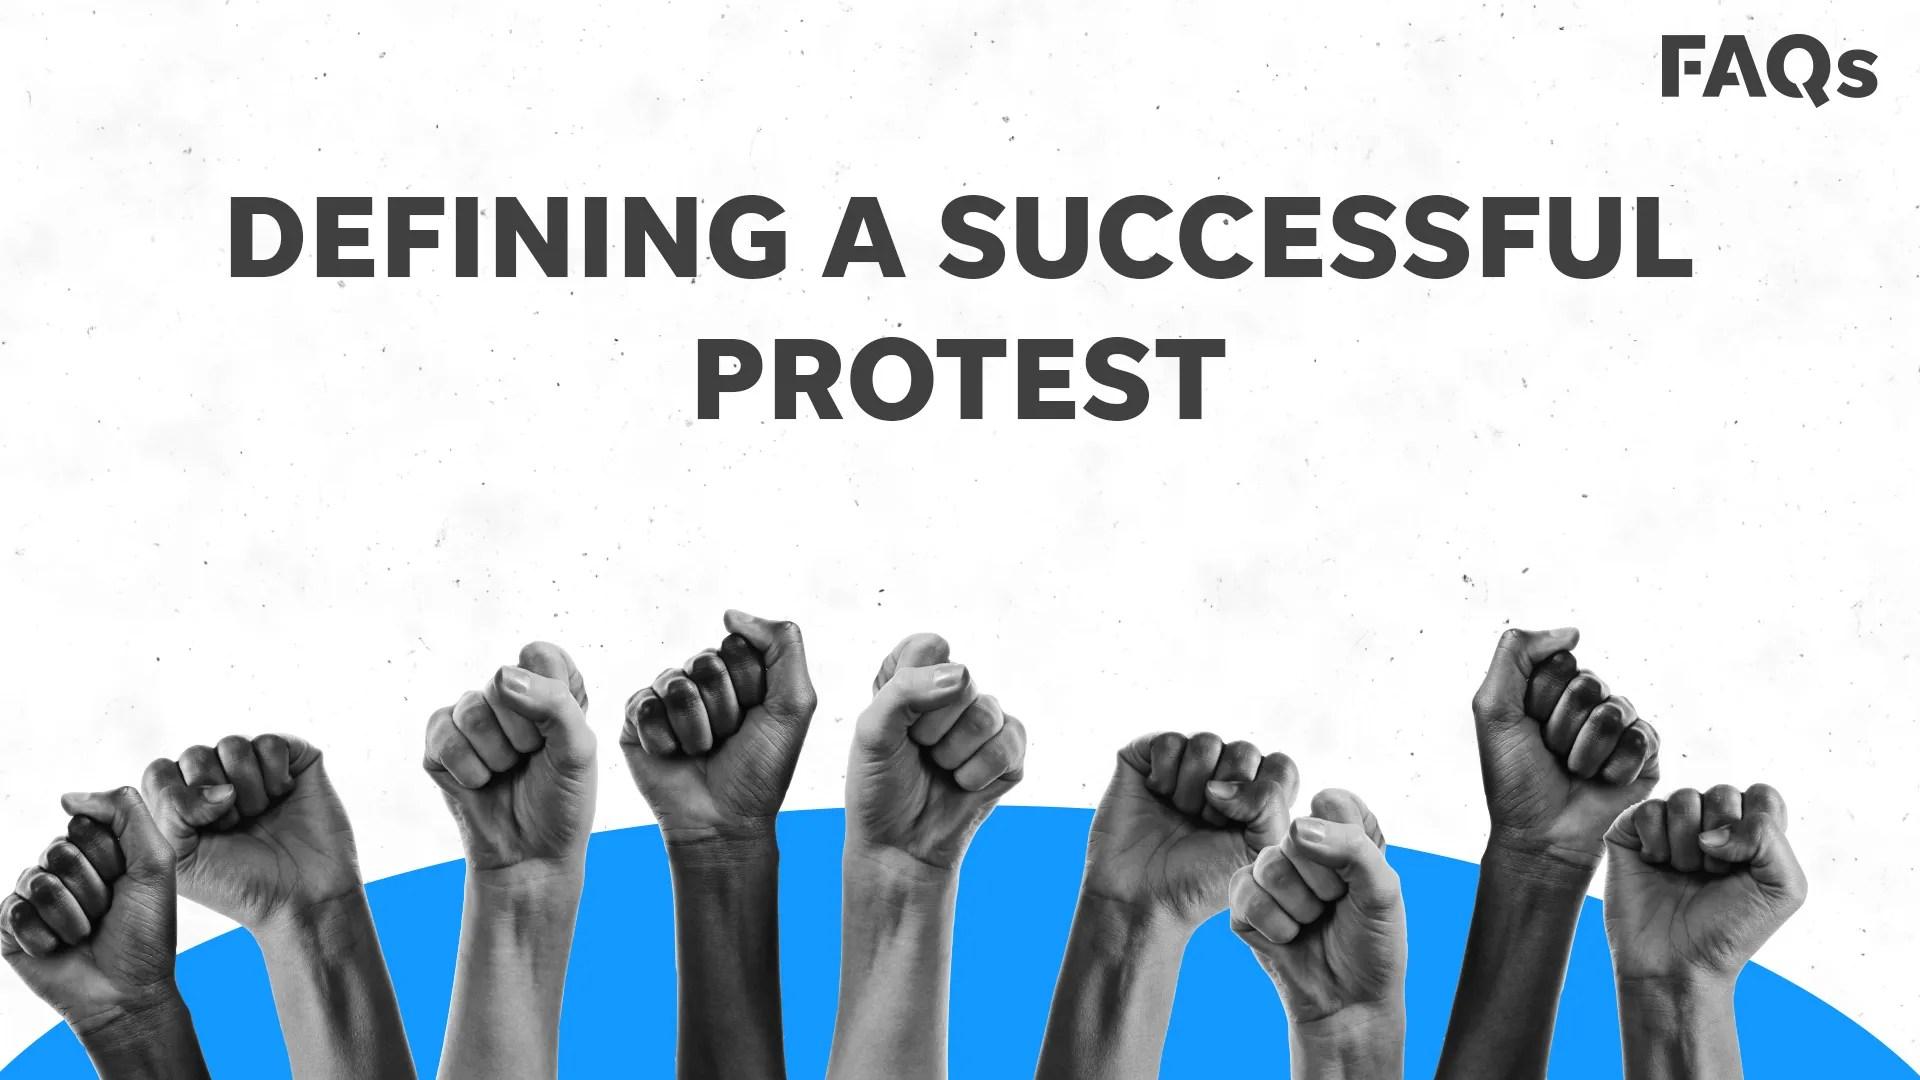 49784d3a 761c 4511 84e9 e8c02e9a3a15 RectThumbnail ProtestsSuccess